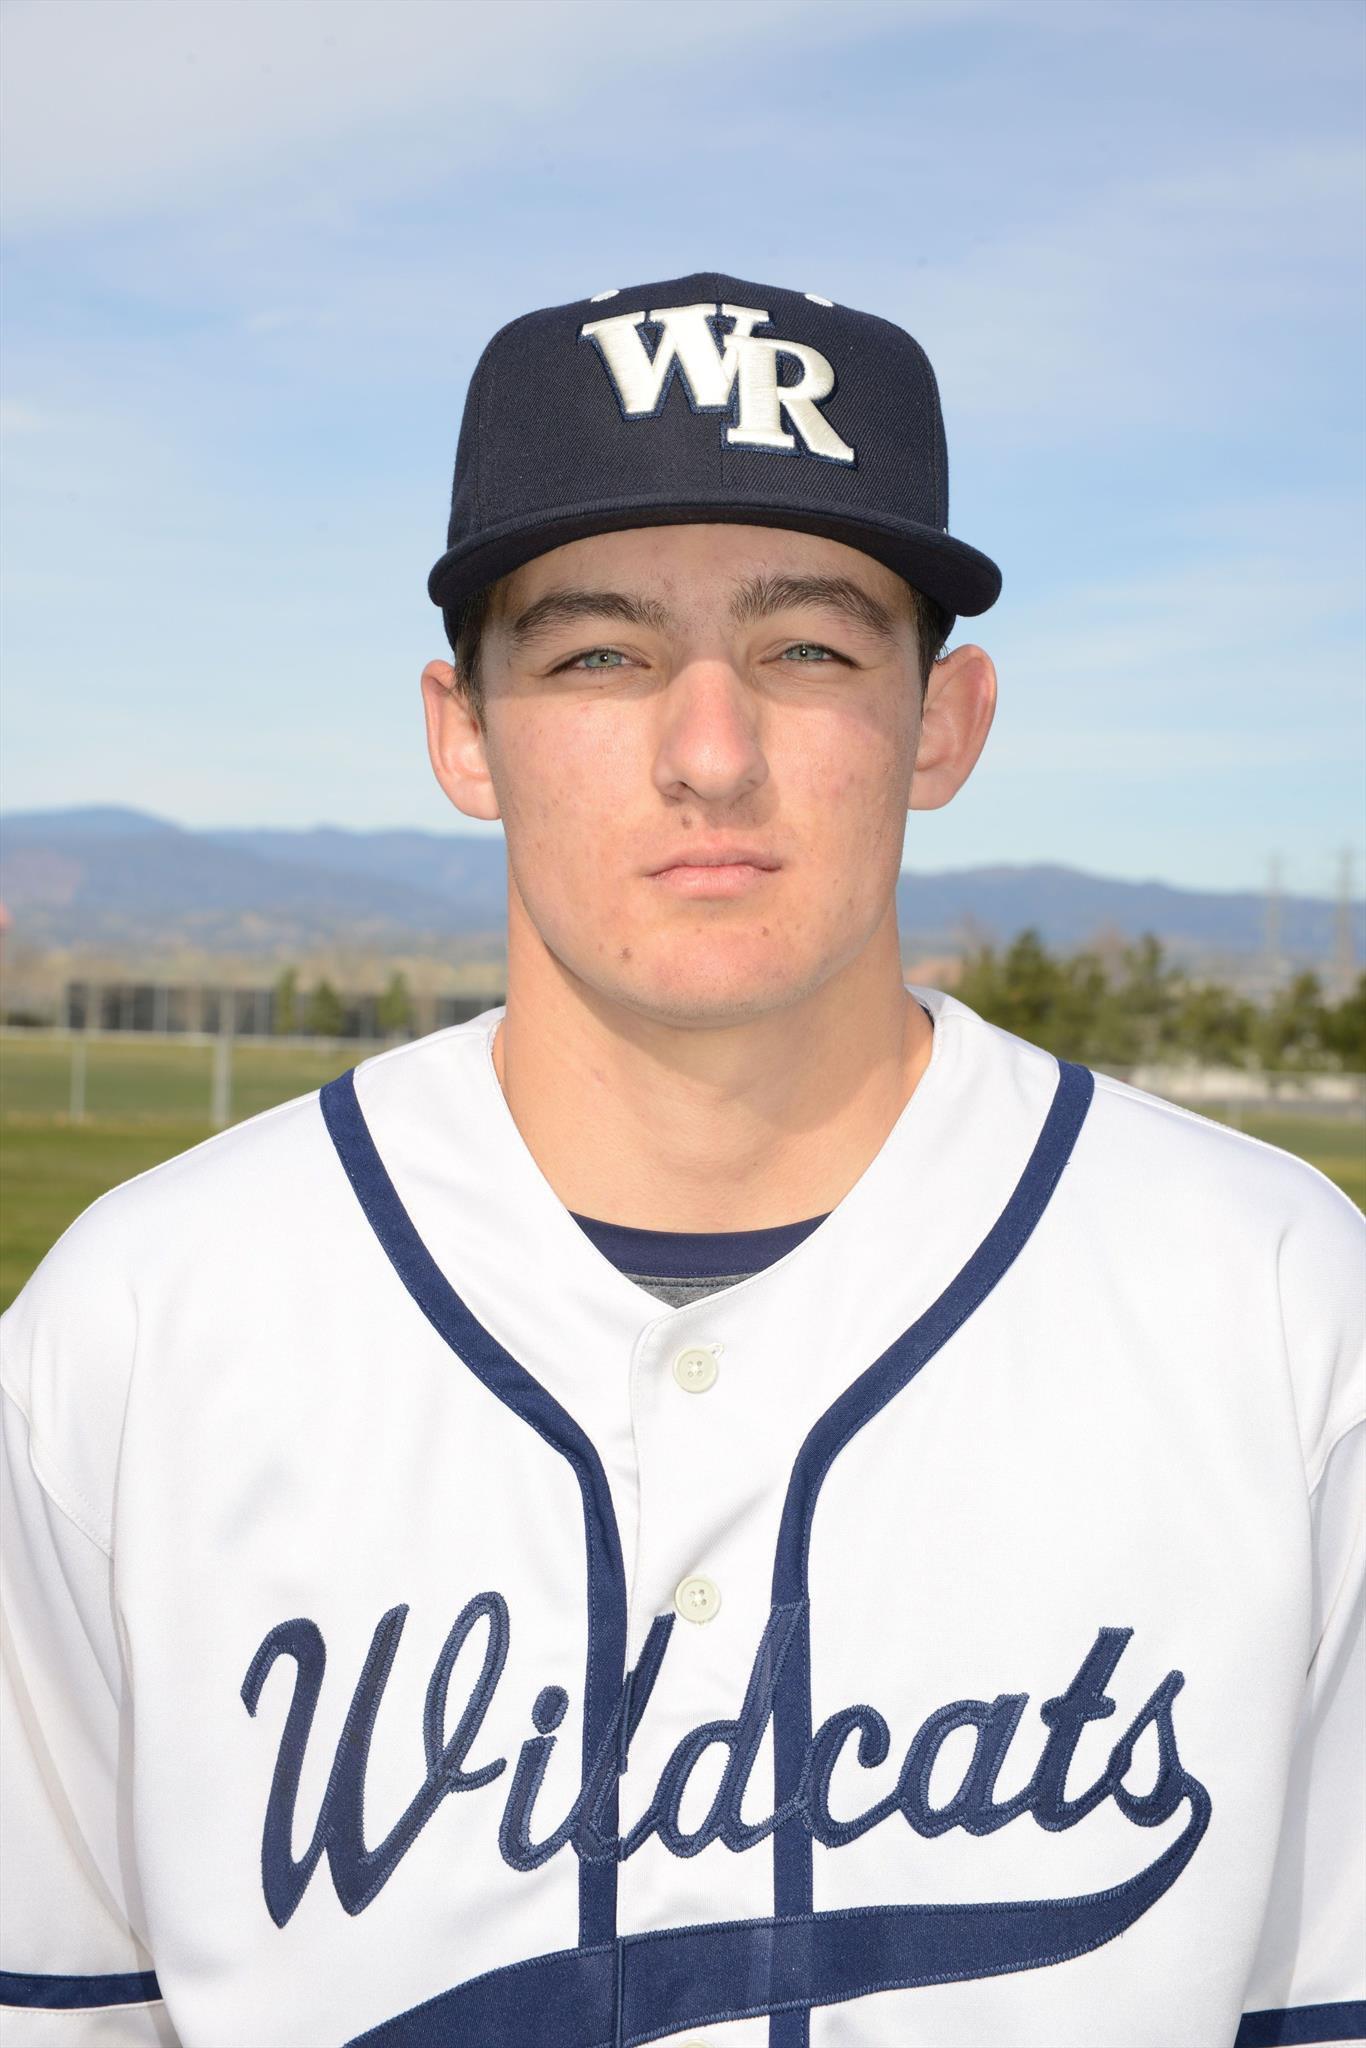 Jd Callahan Profile photo.